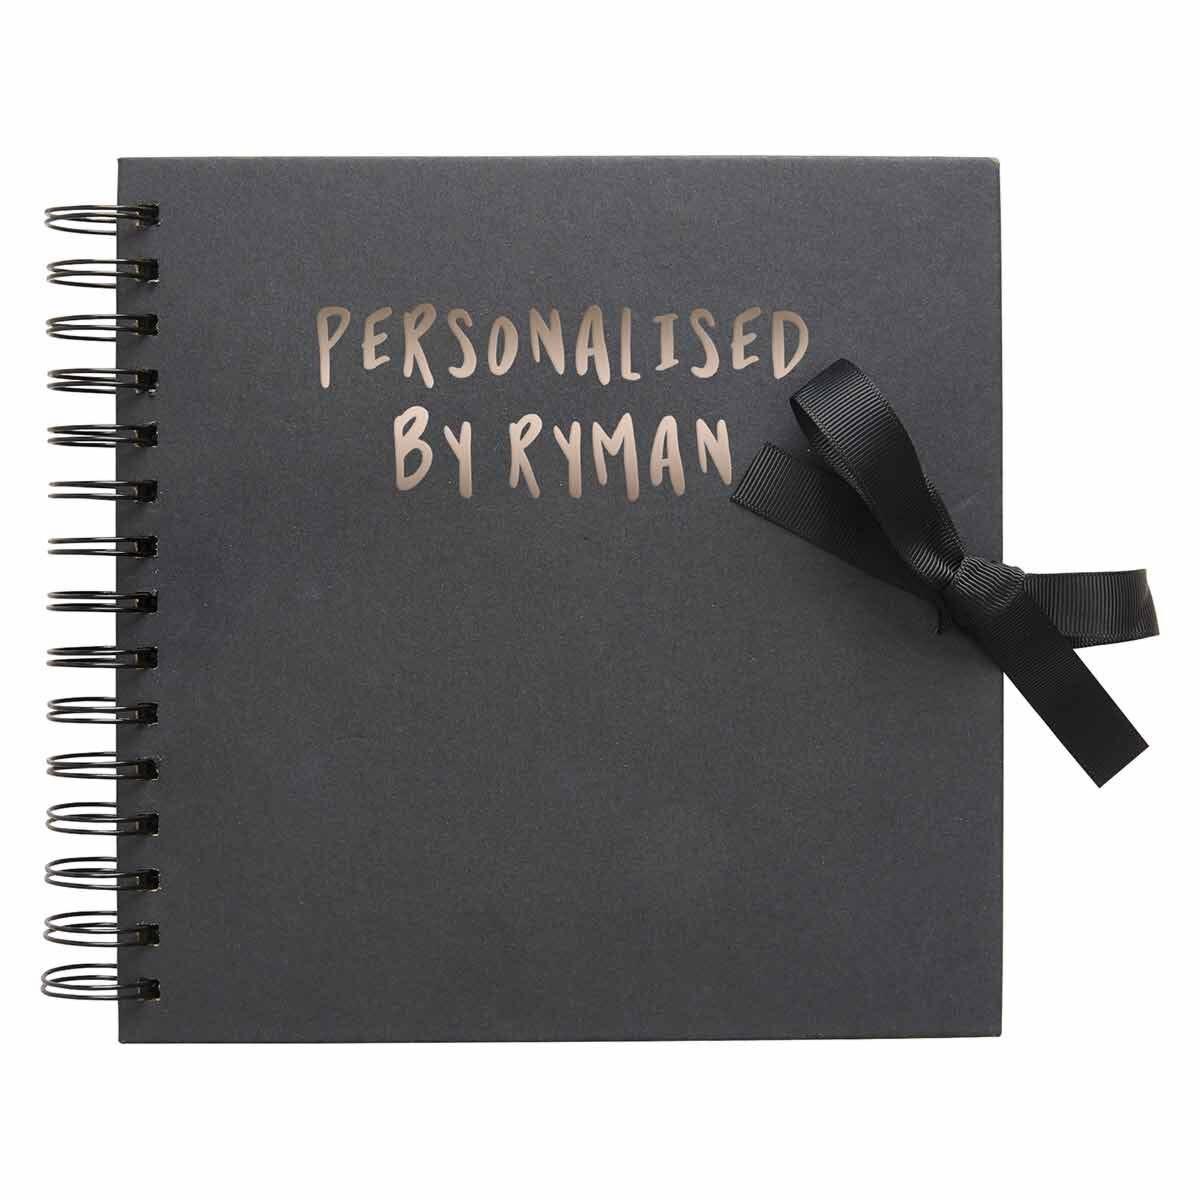 Personalised Scrapbook 8x8 Black Copper